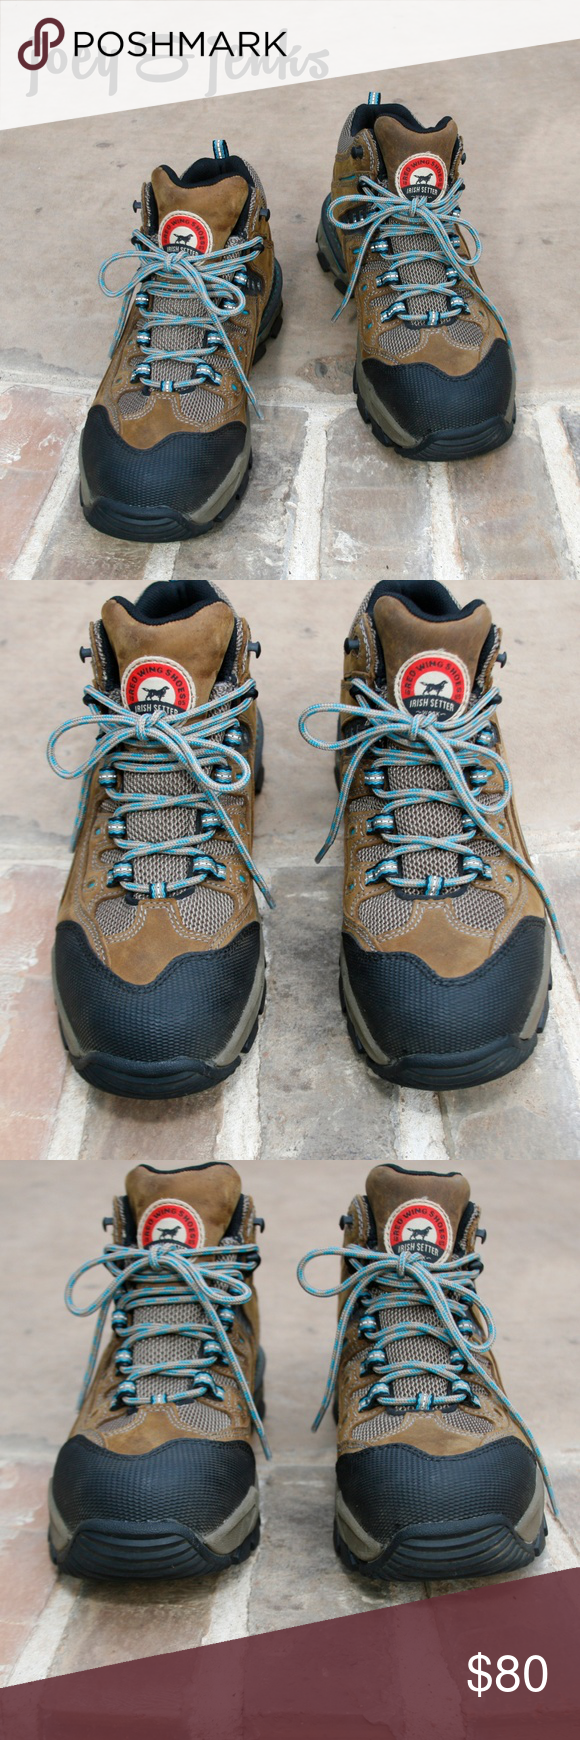 Red Wing Irish Setter Waterproof Work/Hike Boots 9